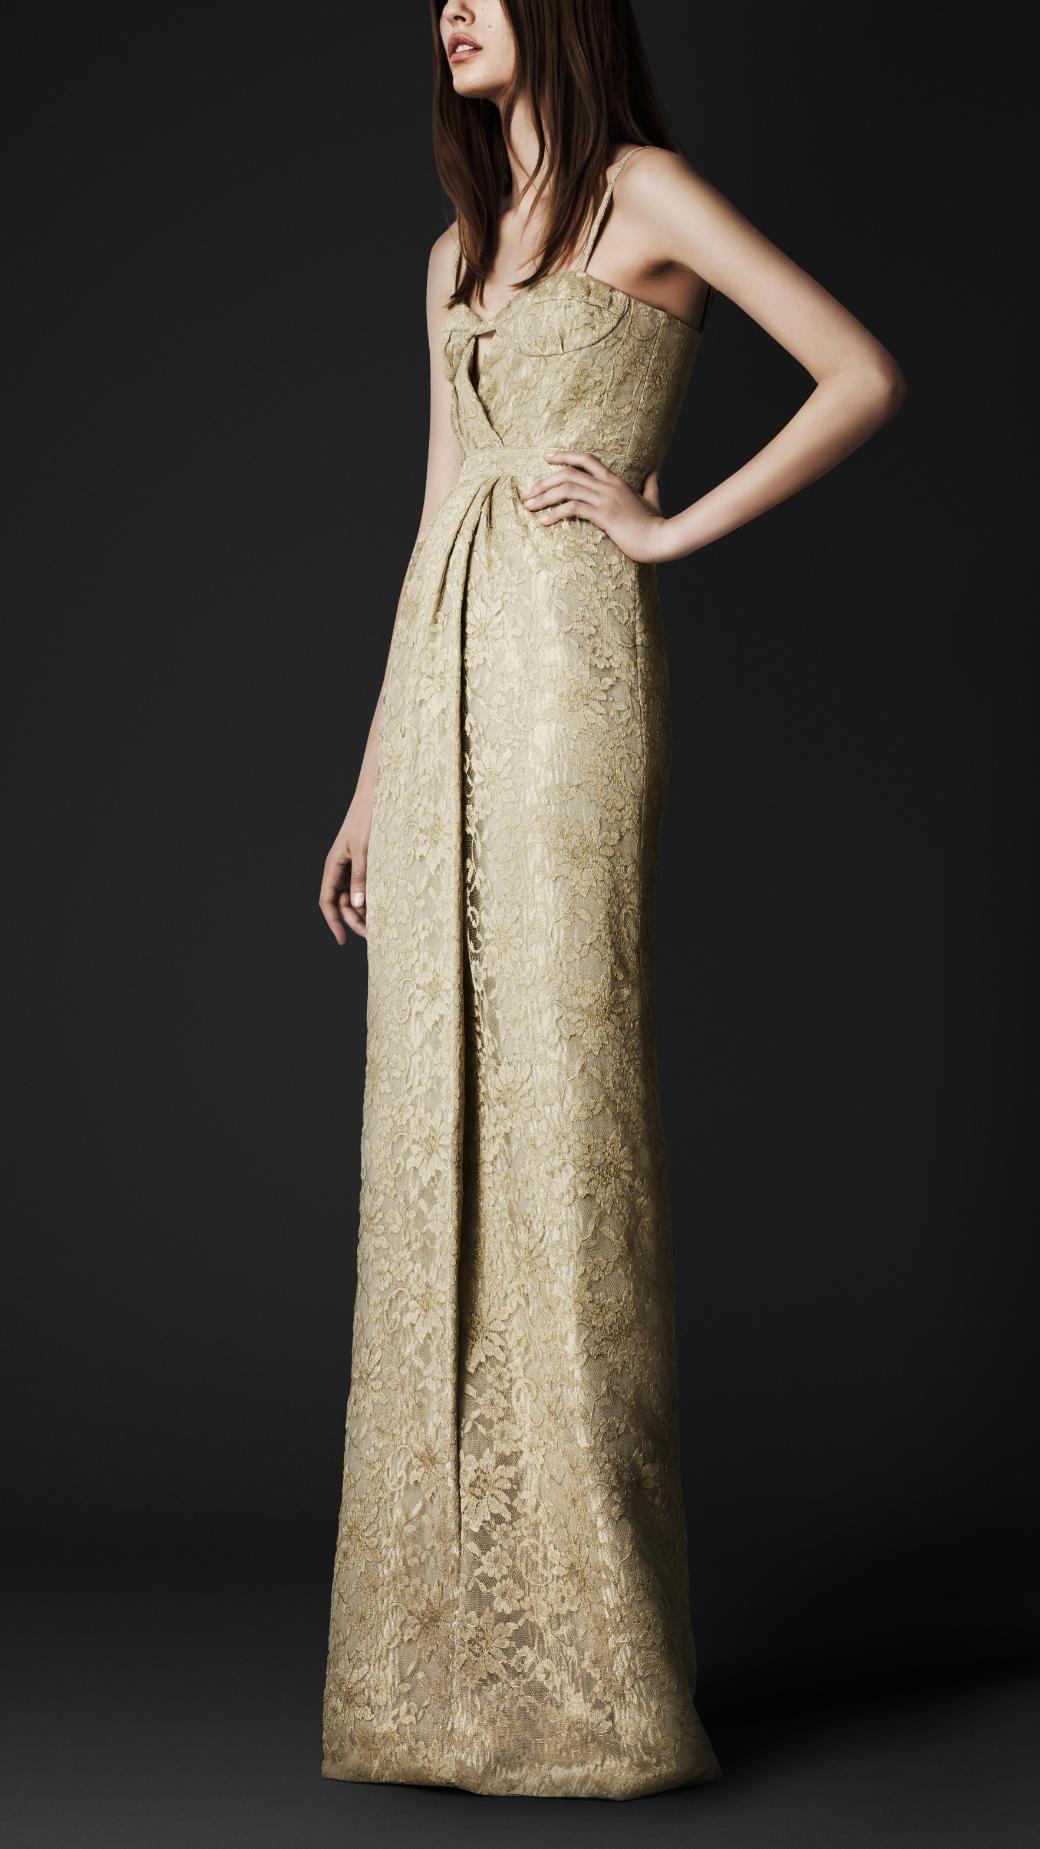 66c6ab76c82a1 Lyst - Burberry Prorsum Floorlength Lace Bustier Dress in Metallic